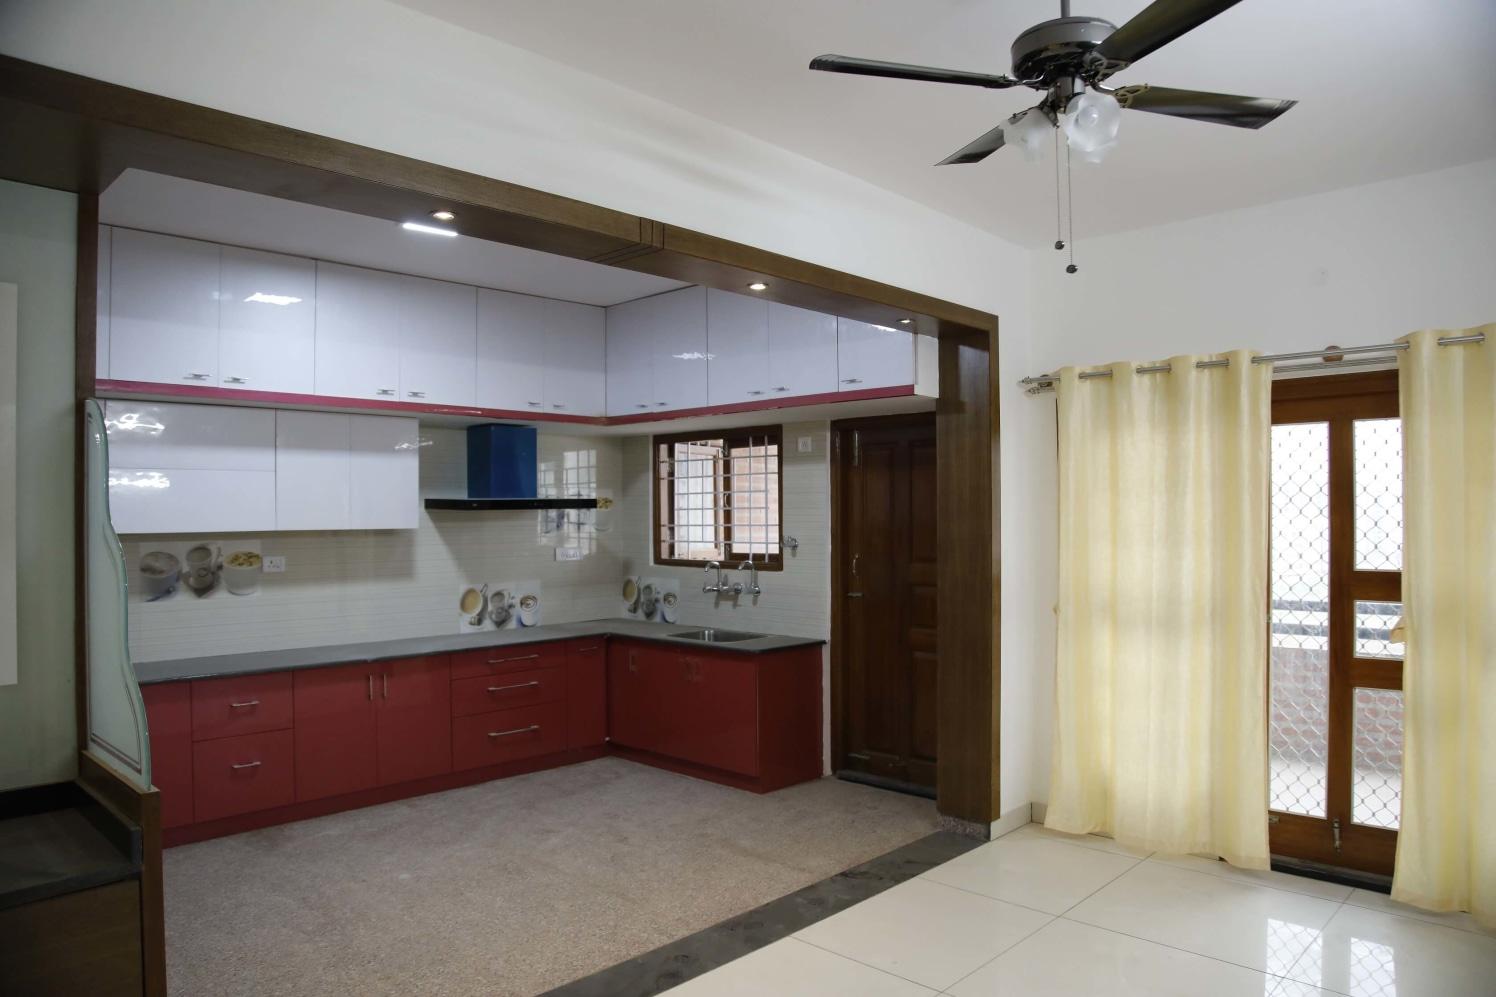 Pragmatic Designing by Naushad Modular-kitchen Modern | Interior Design Photos & Ideas